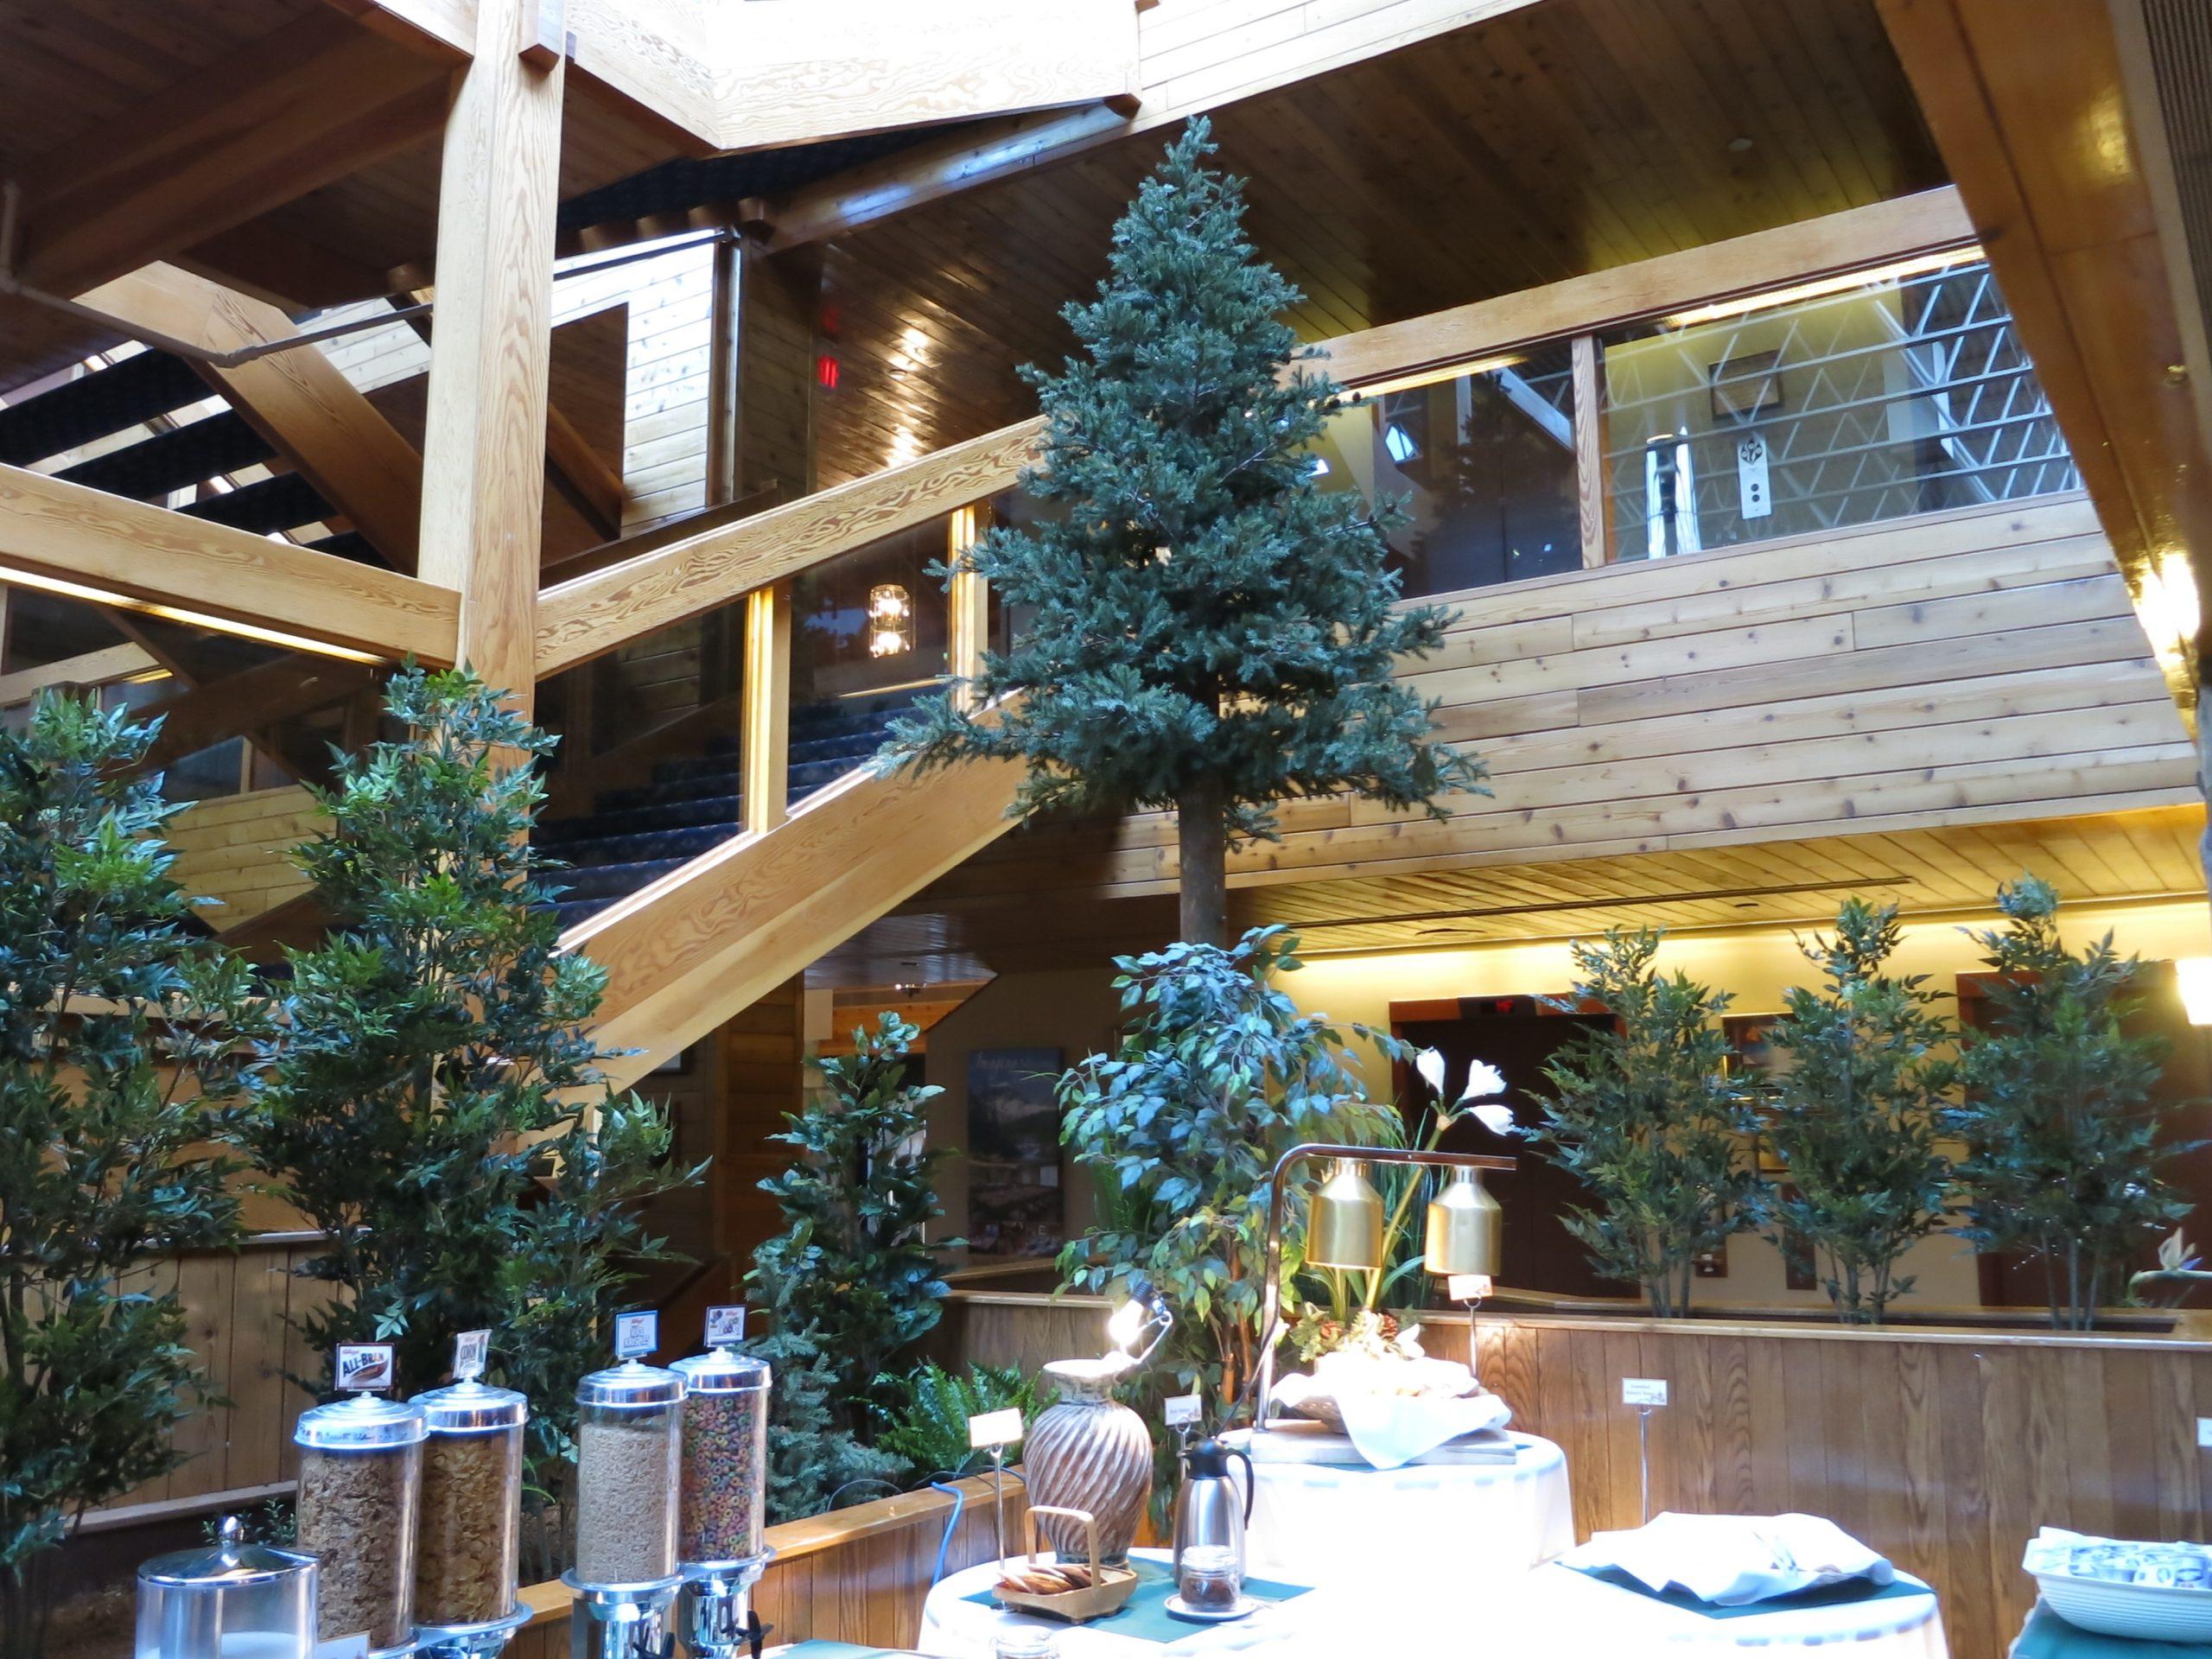 Oversized evergreen display with tall evergreen trees in hospitality space of Sawridge Inn Edmonton